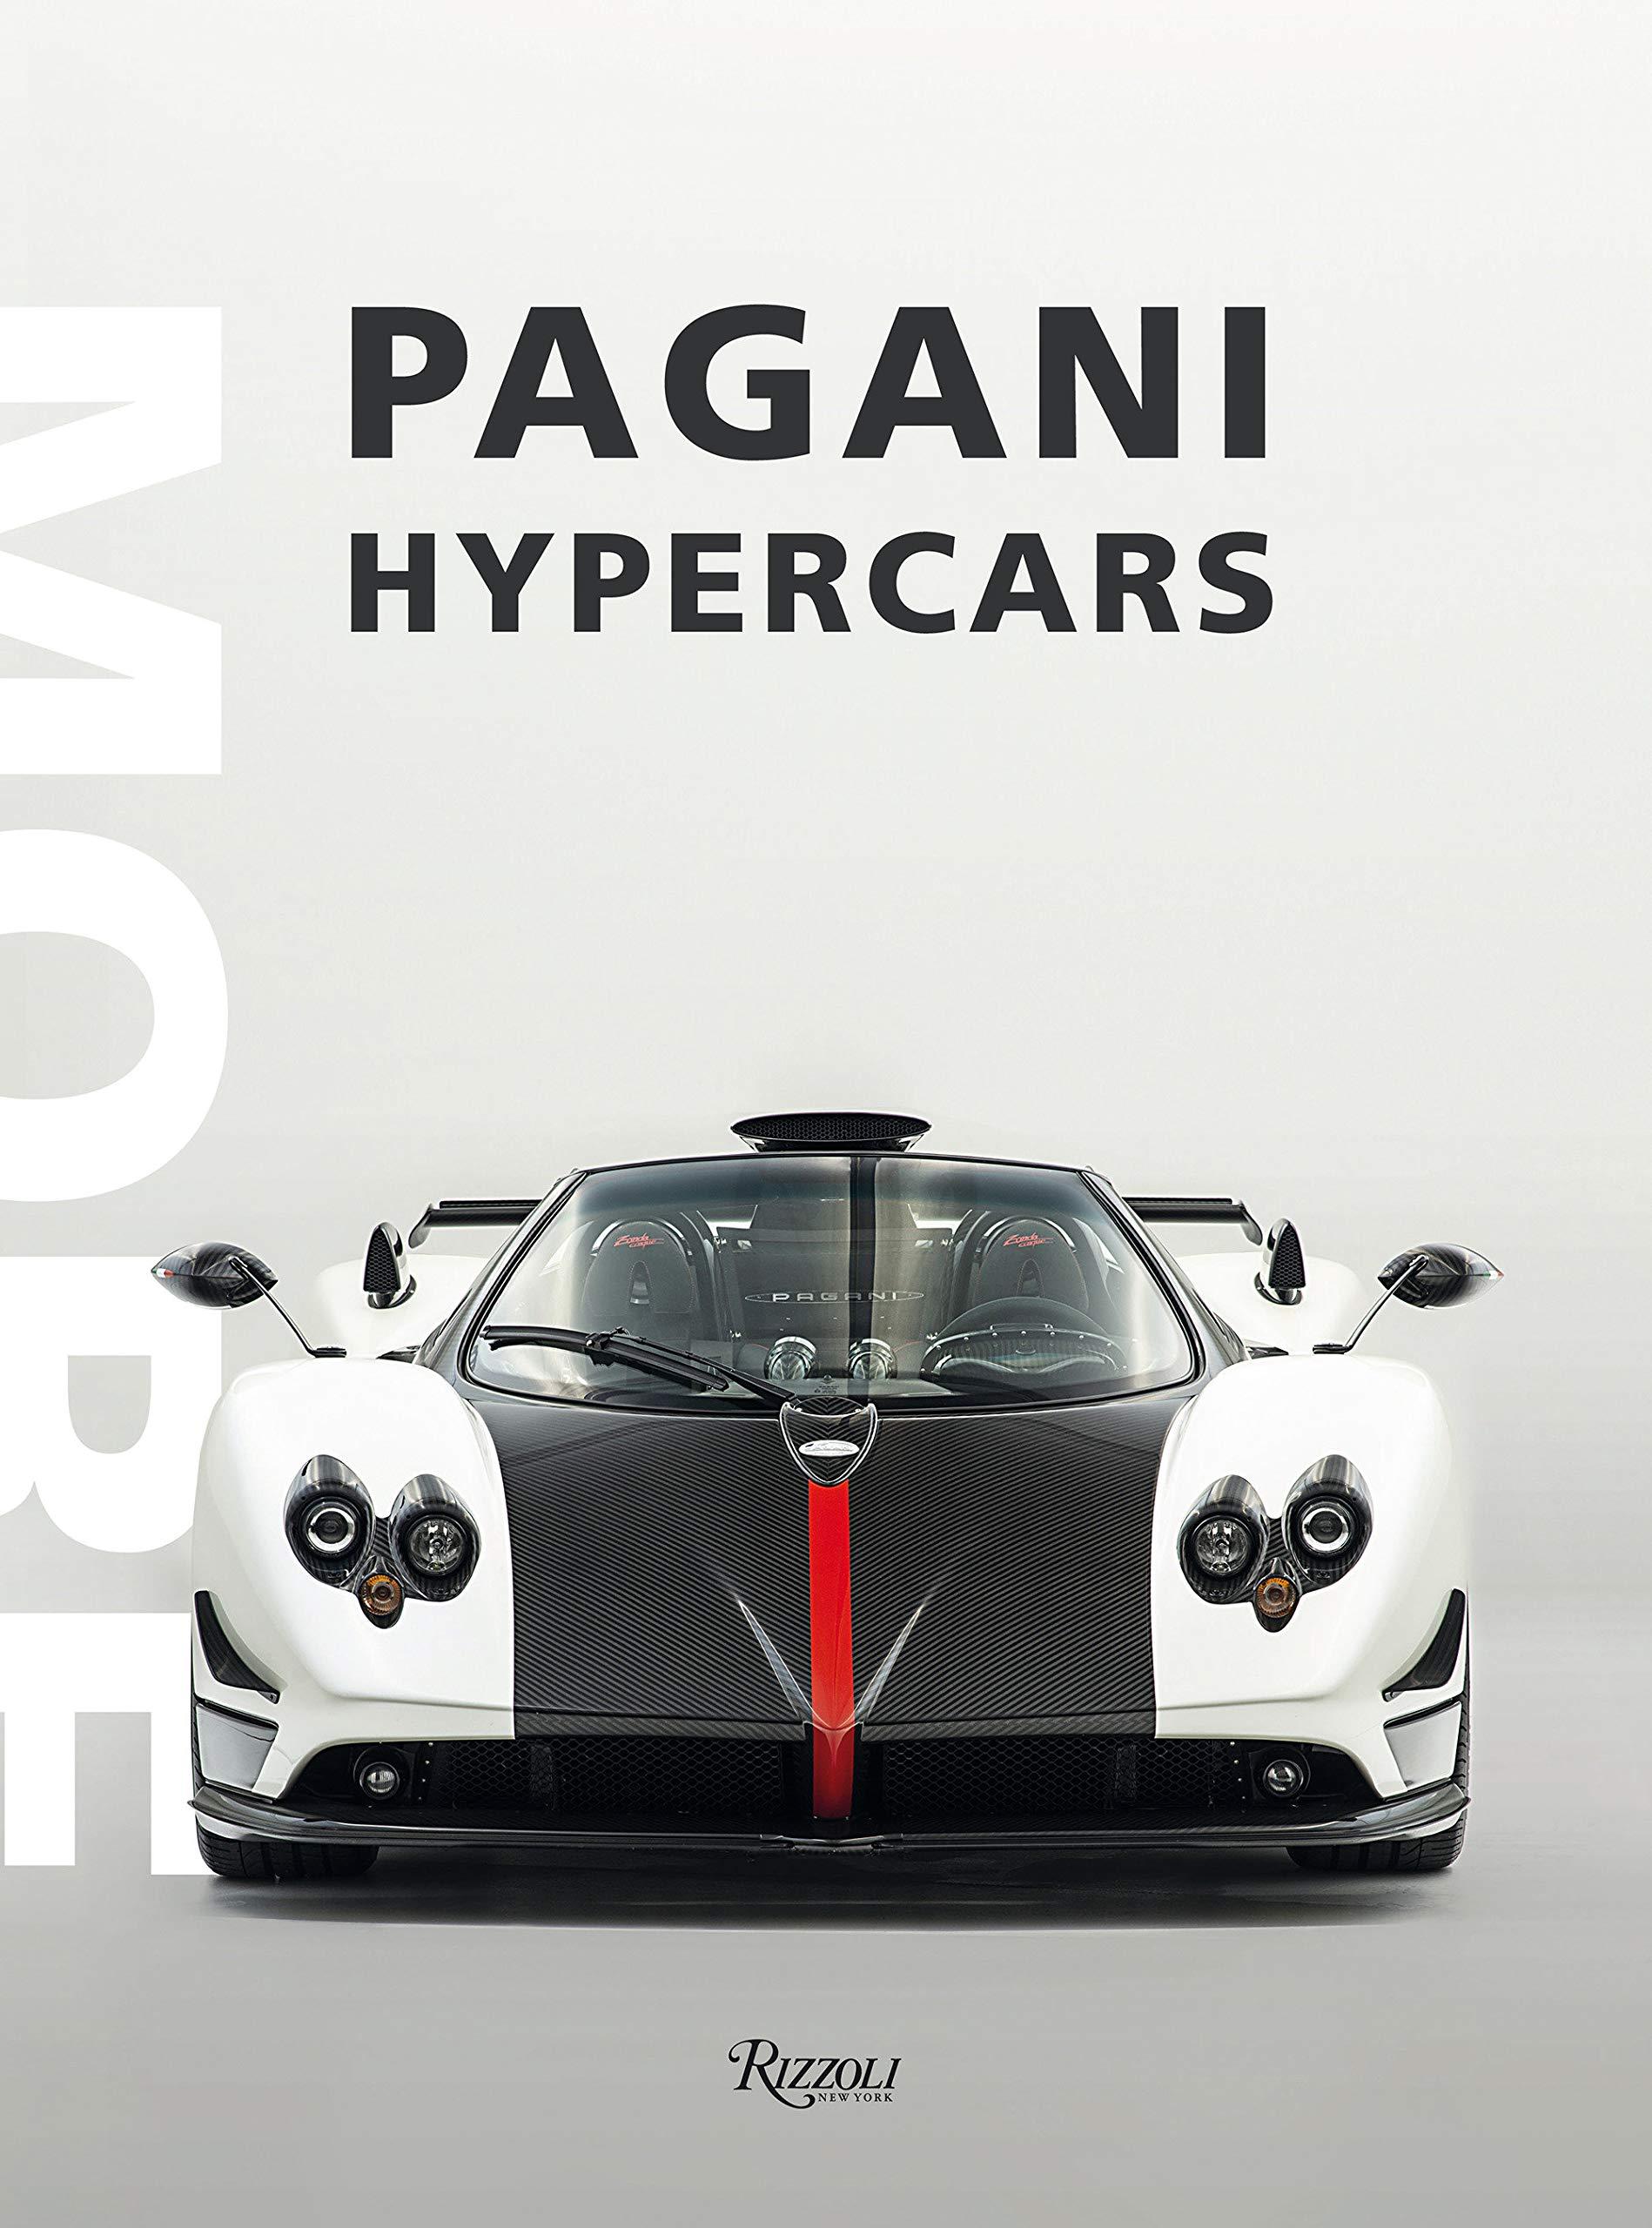 Pagani Hypercars Amazoncouk Horatio Pagani